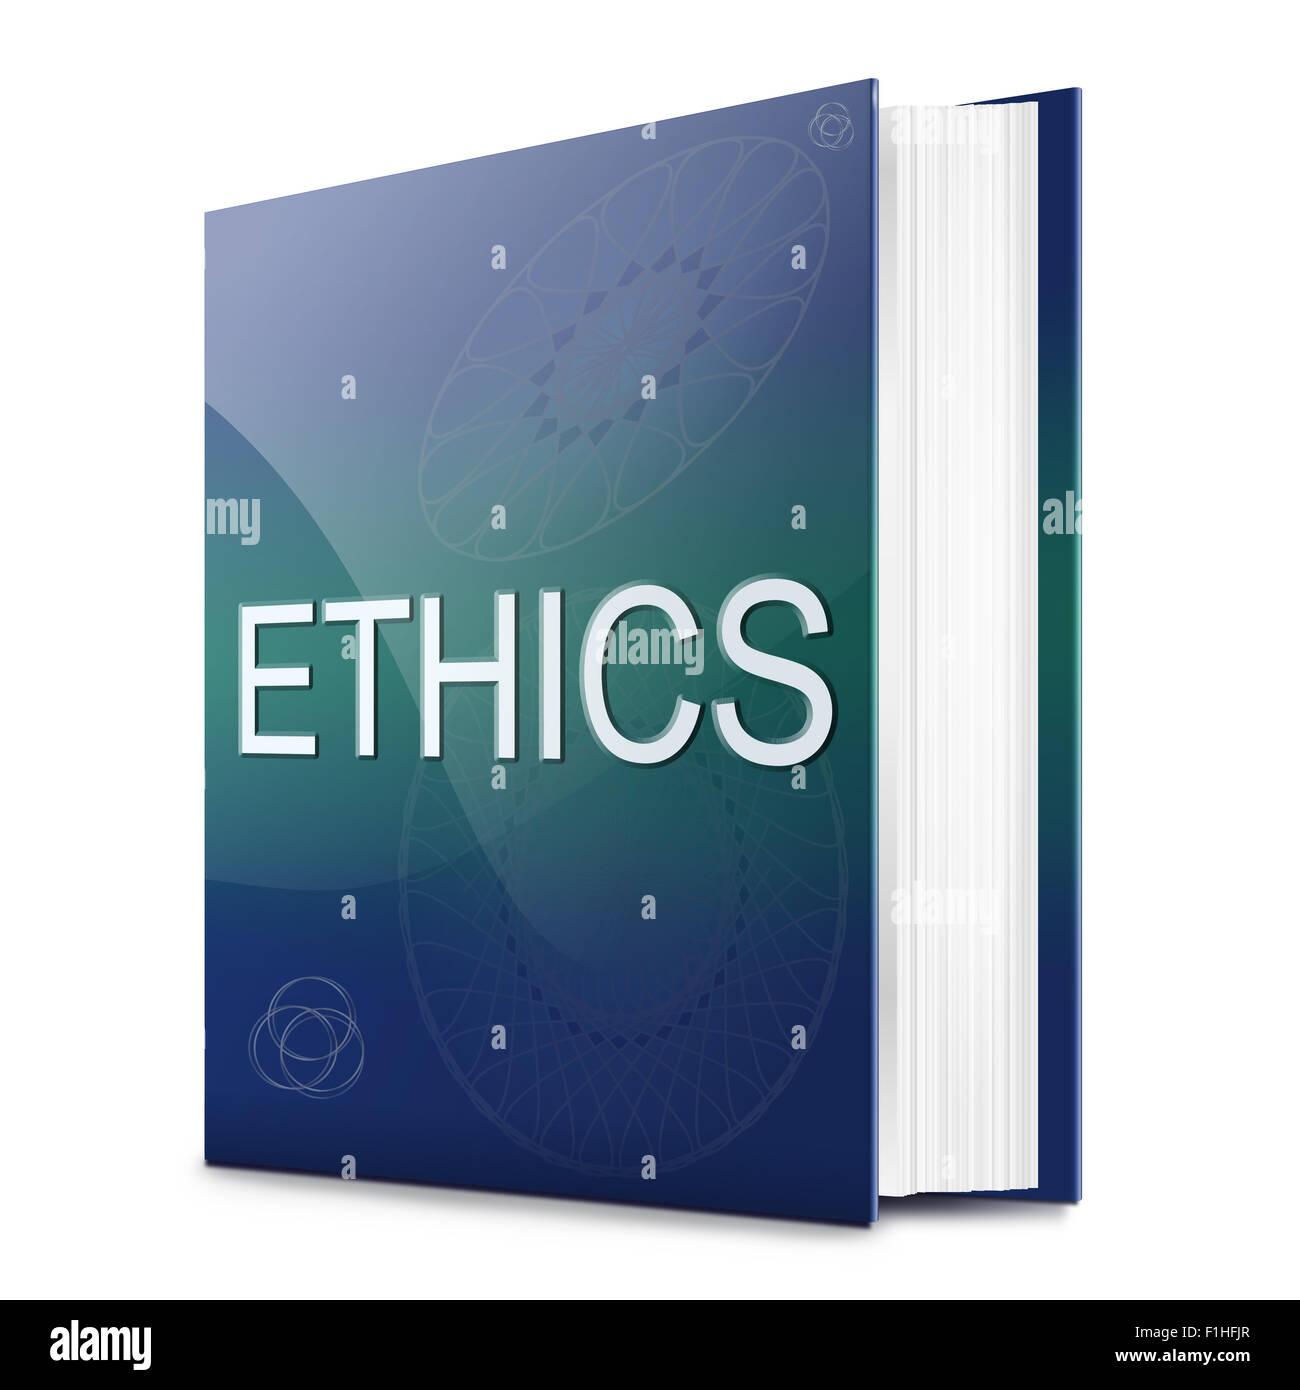 Ethics concept - Stock Image